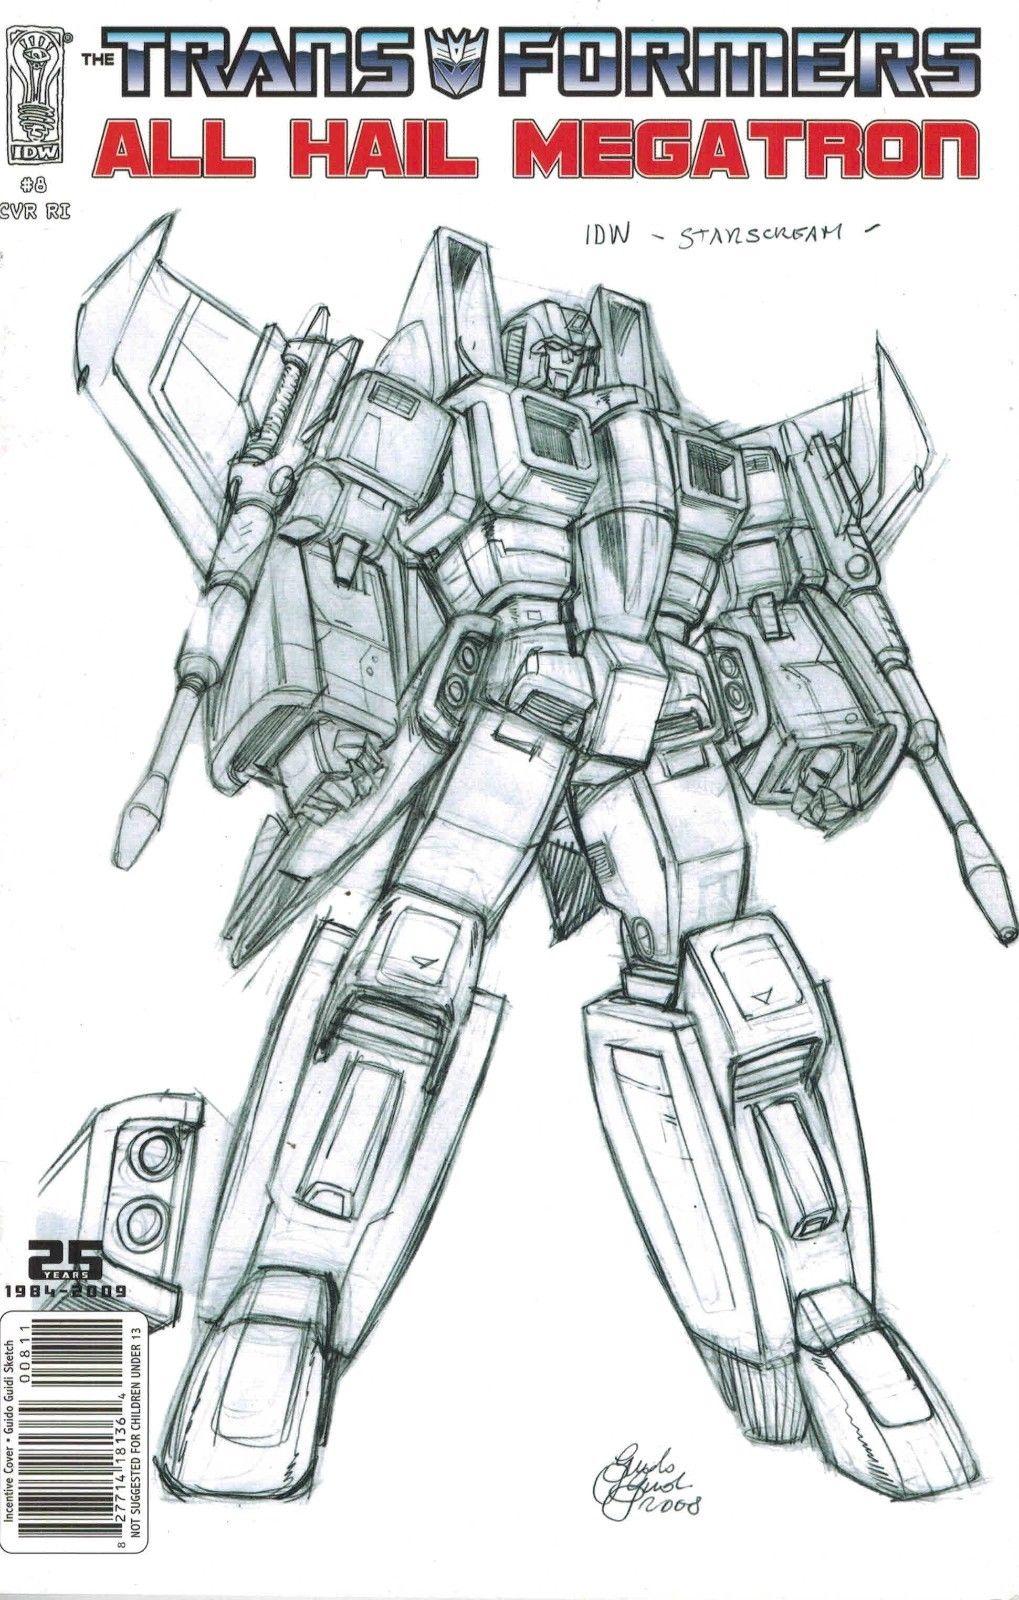 Transformers_Guido_Guidi.jpg